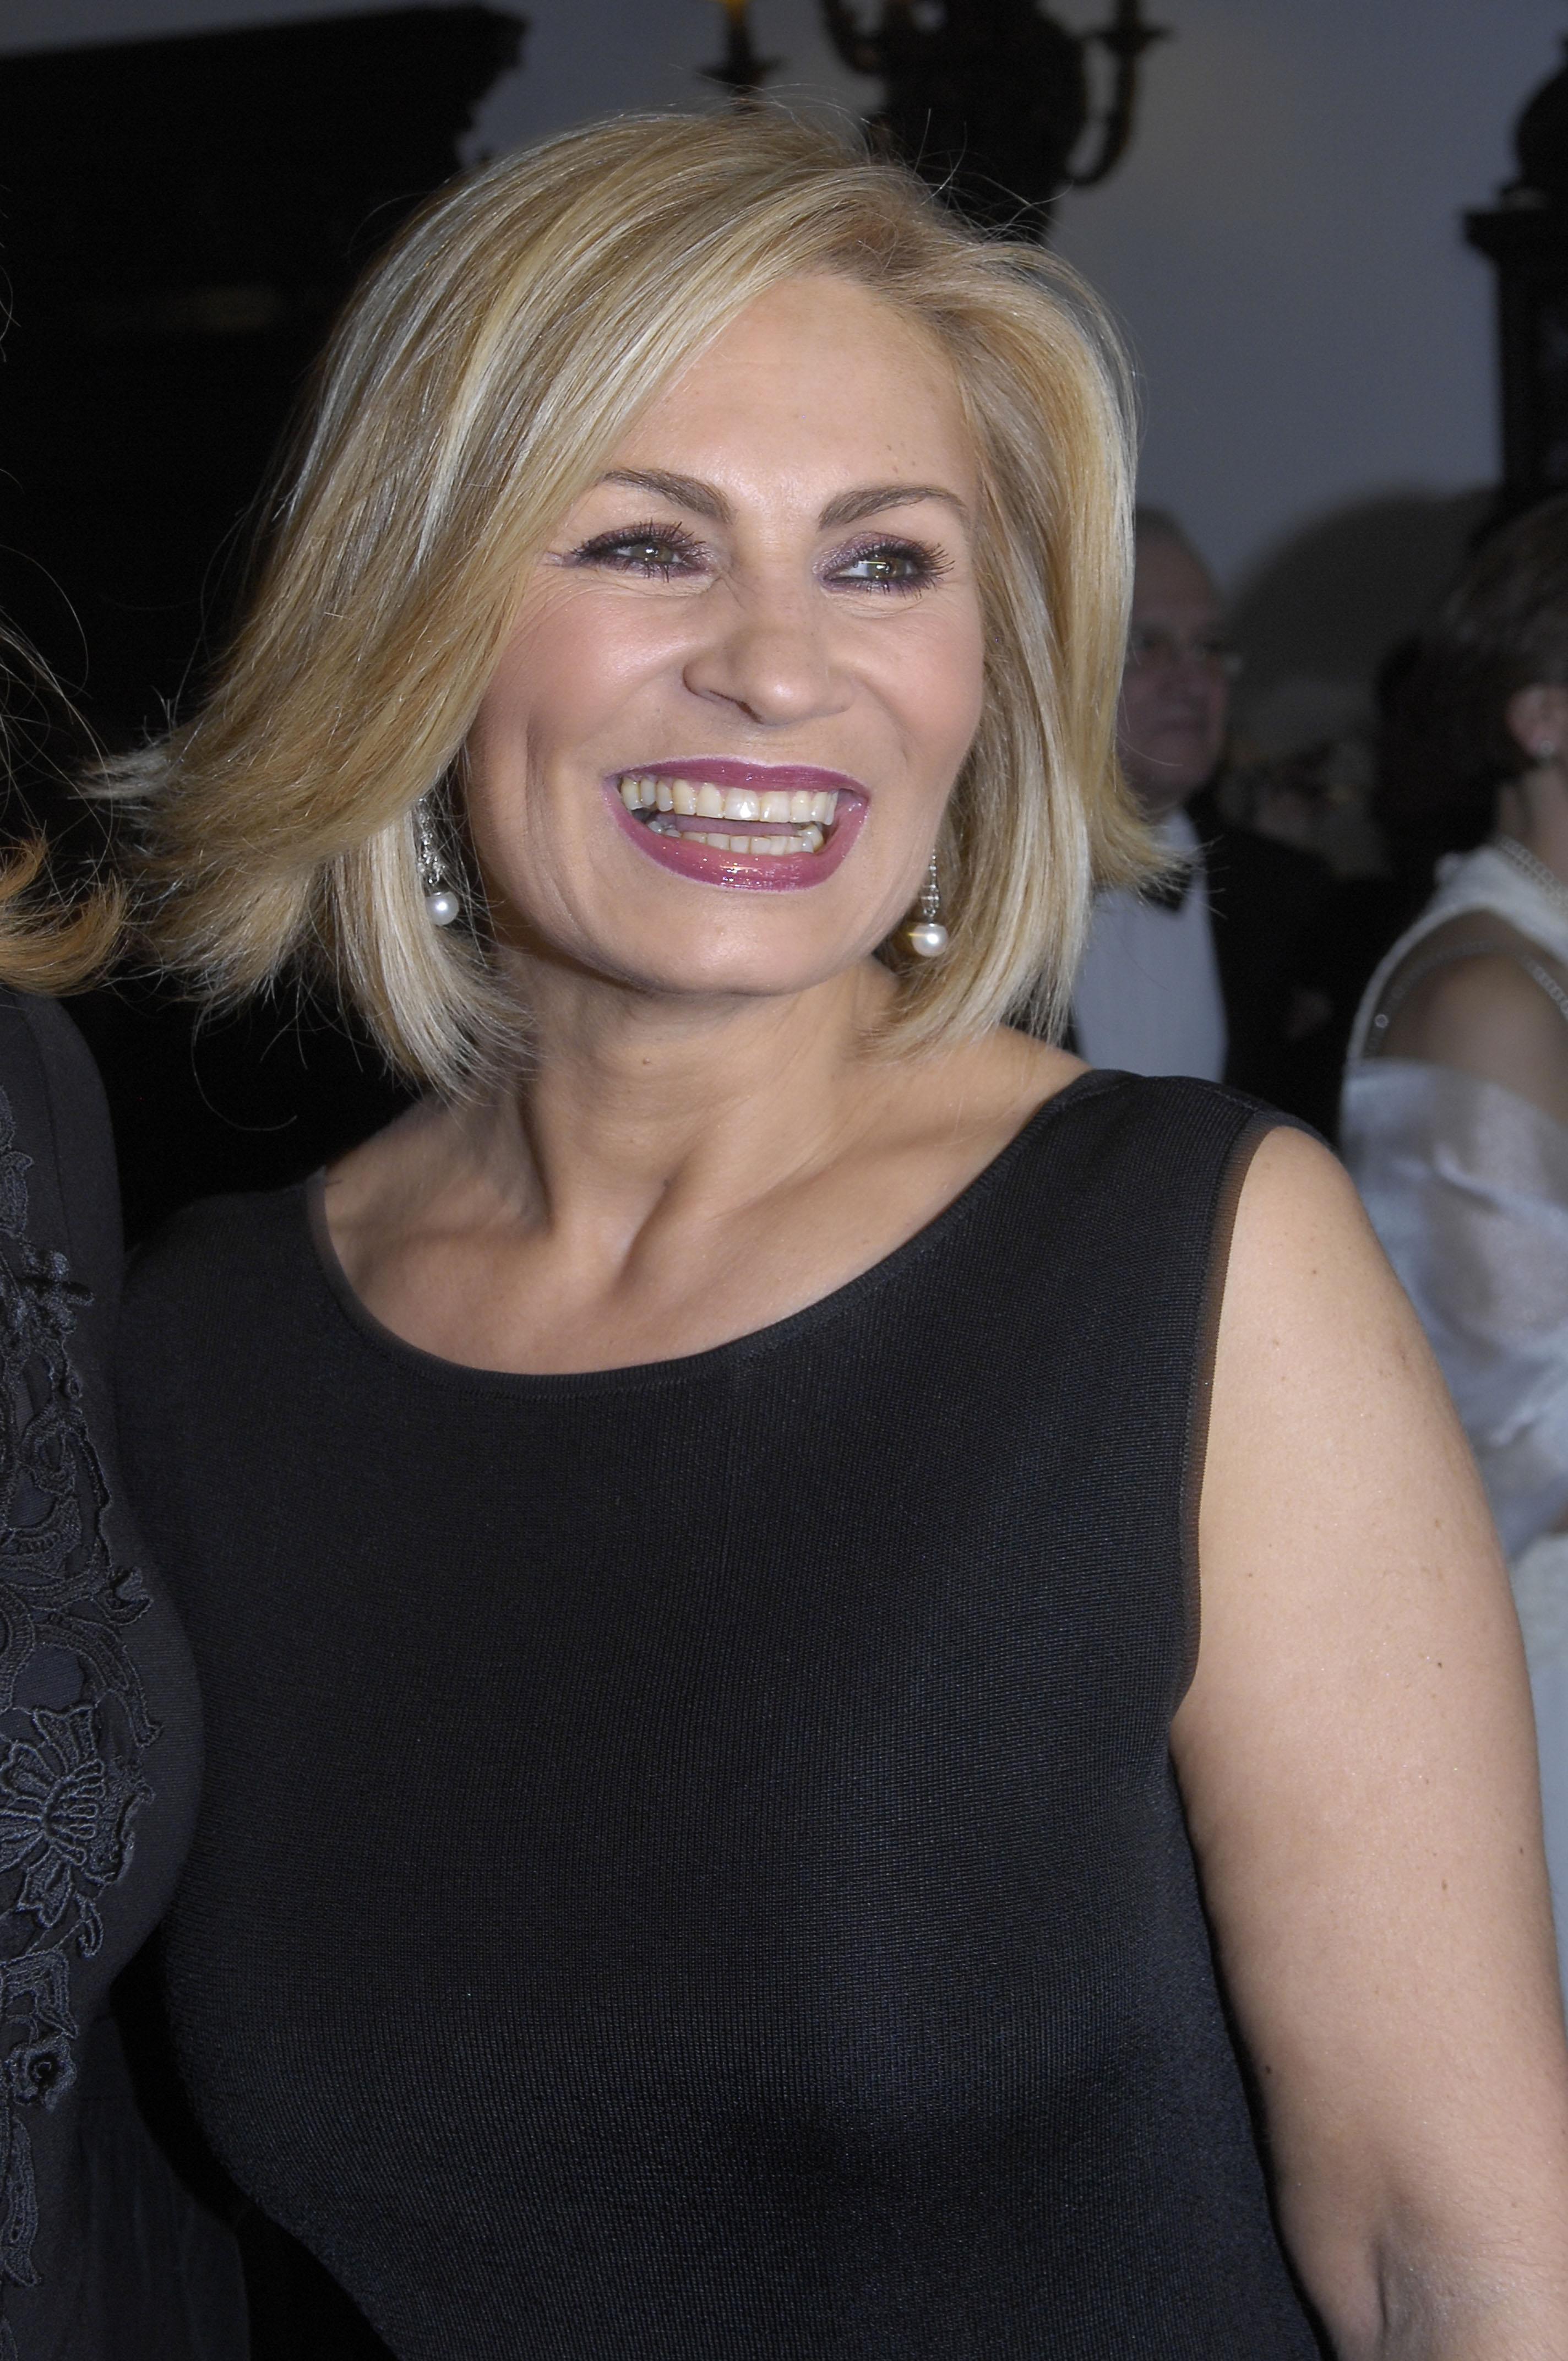 Alice Kohiakovska